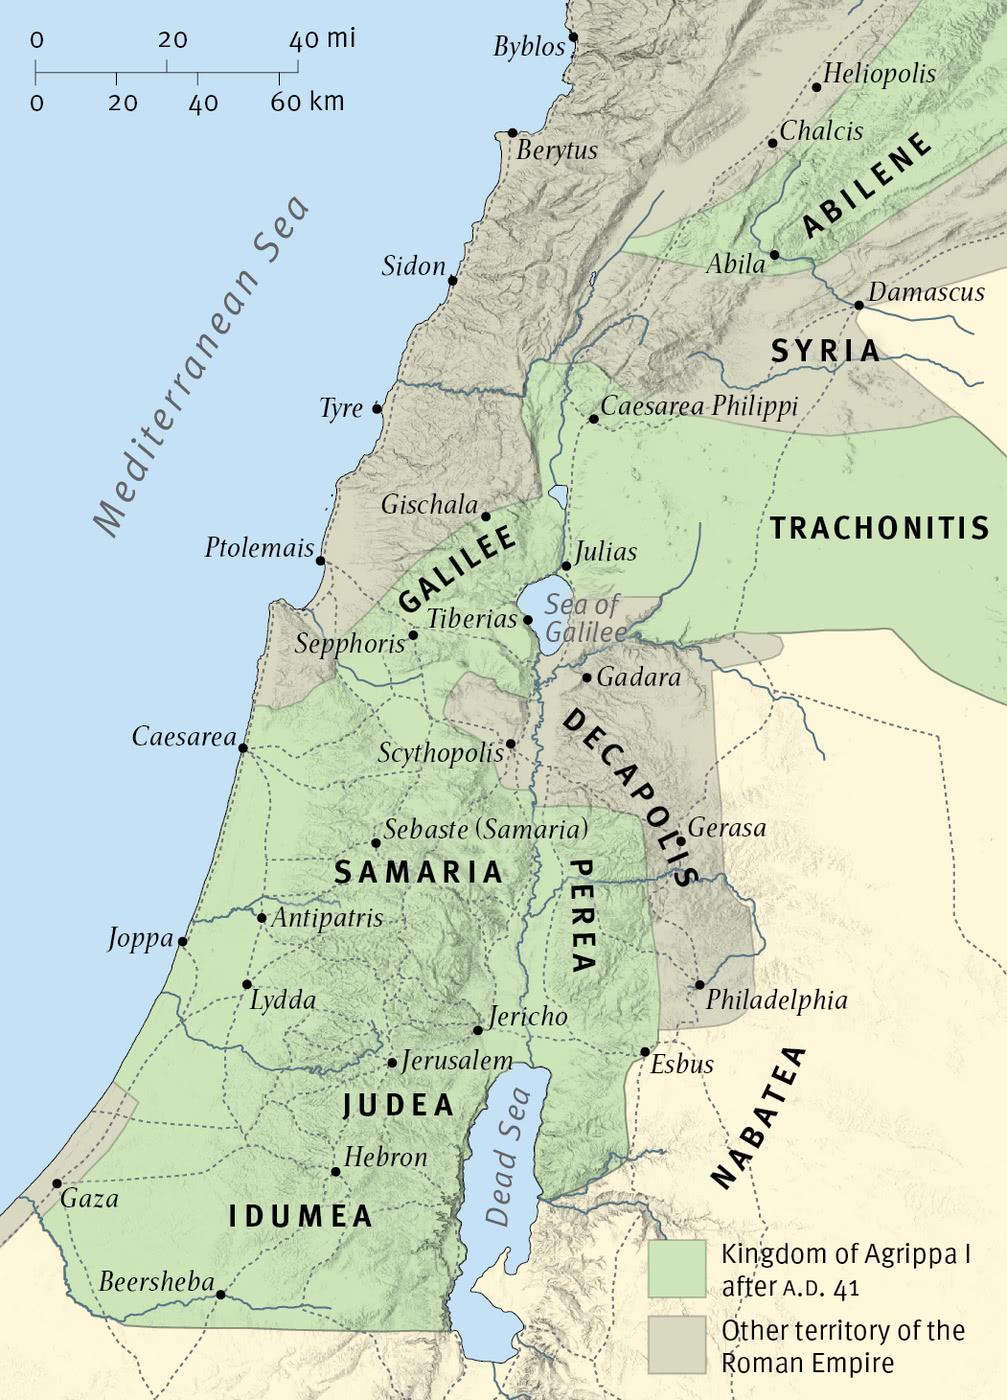 The Kingdom of Herod Agrippa I